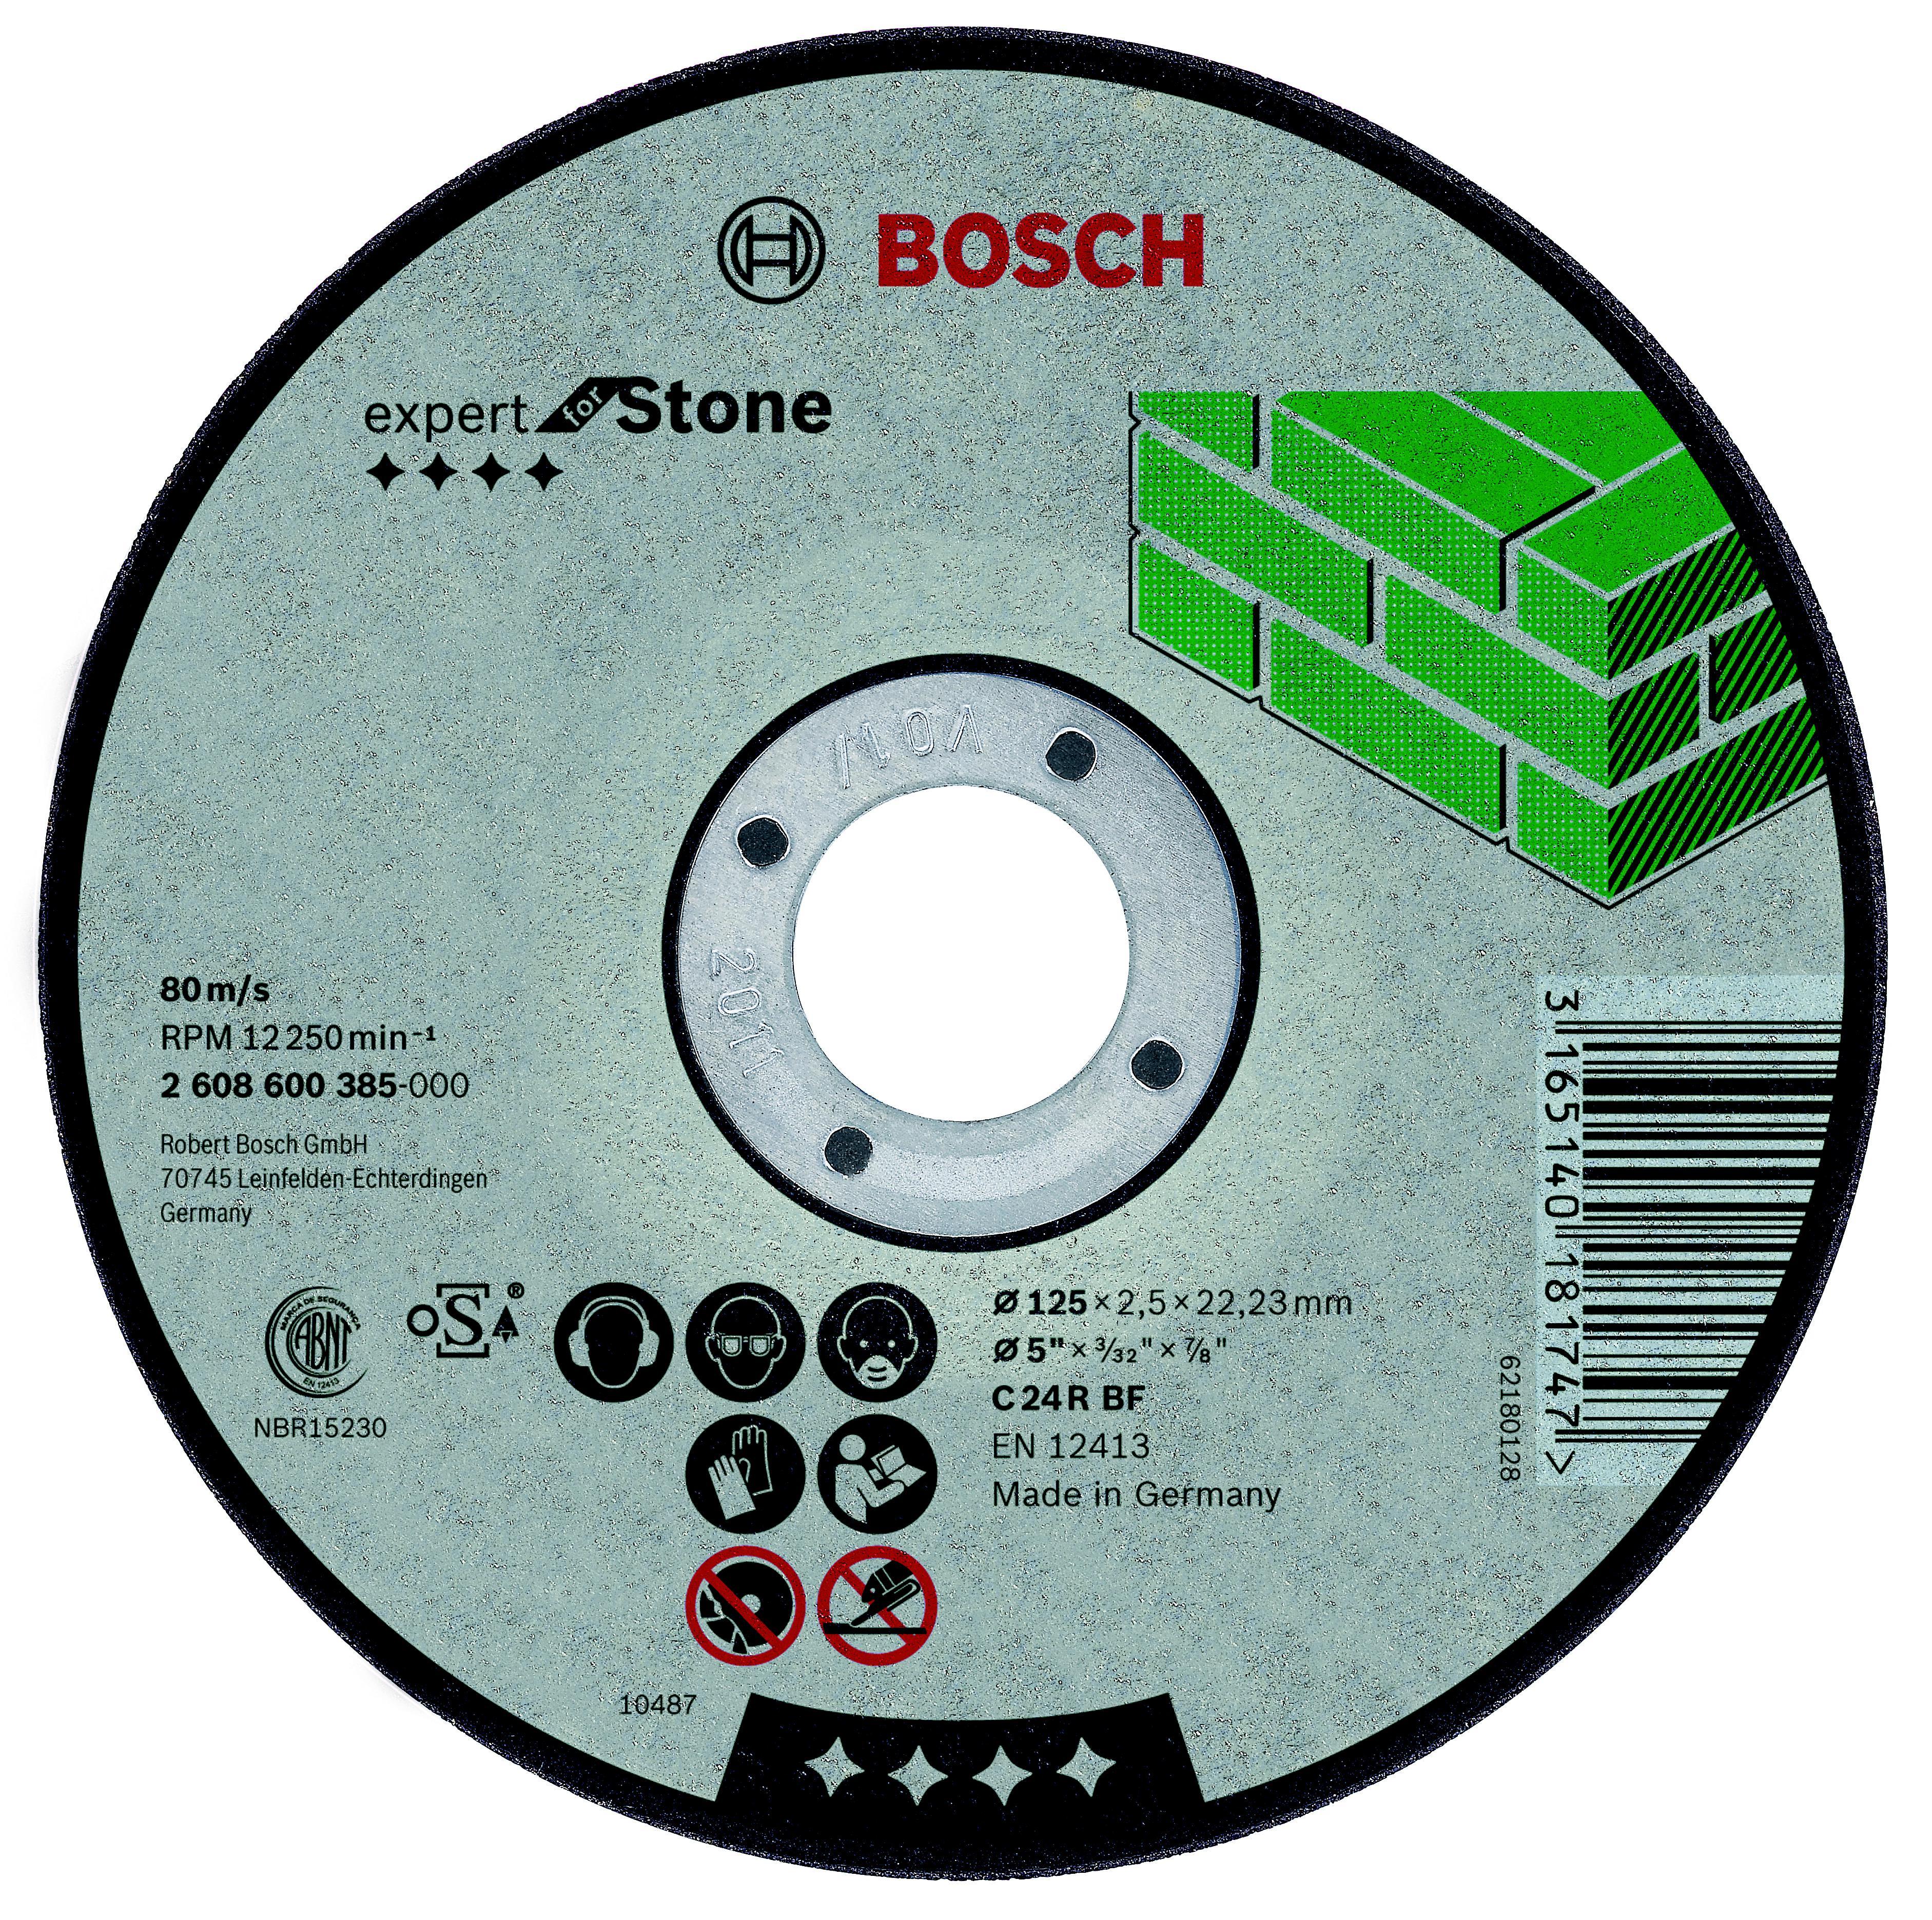 Круг отрезной Bosch 150x2,5x22 по камню (2.608.600.383) круг отрезной hammer 150 x 2 0 x 22 по металлу коробка 200шт